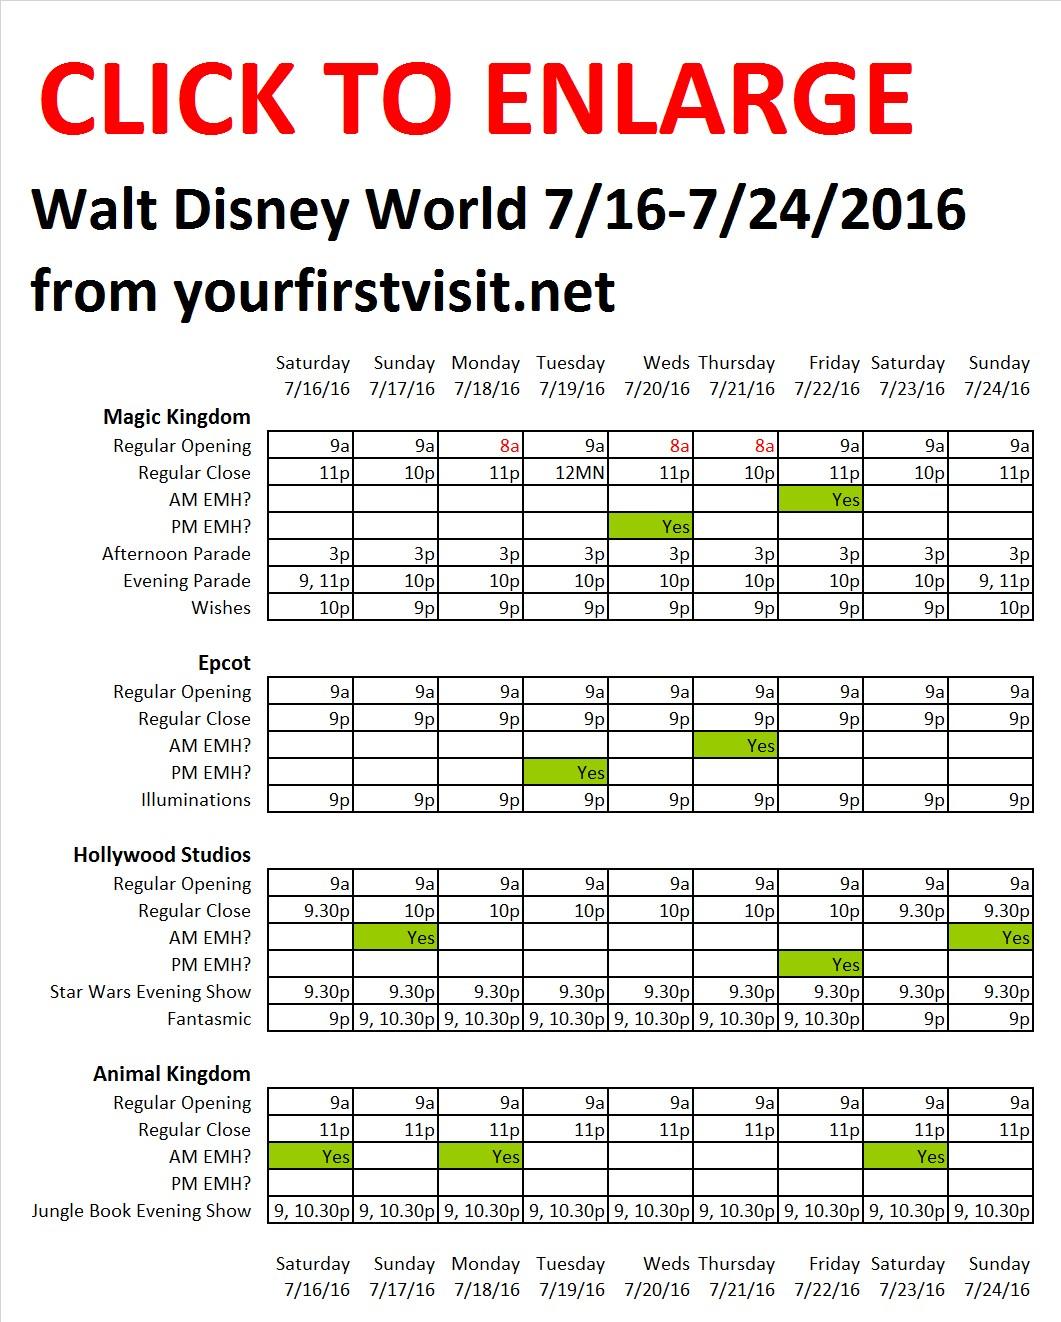 Disney World 7-16 to 7-24-2016 from yourfirstvisit.net